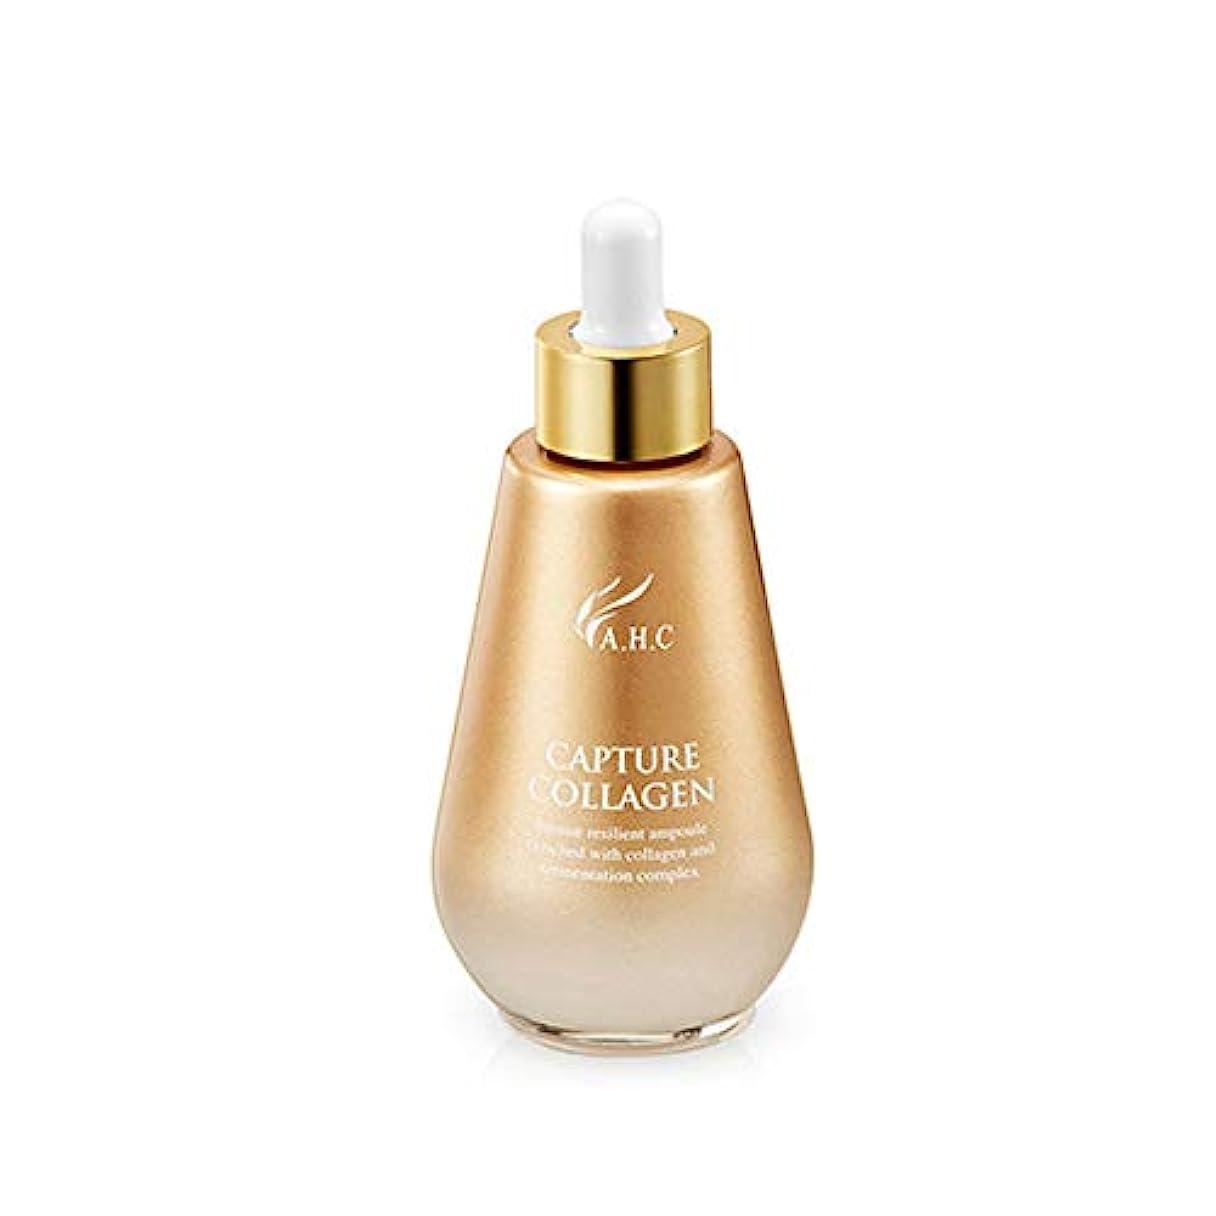 AHCバイタルゴールデンコラーゲンスキンケアセットトナーローションクリームアイクリームアンプル、AHC Vital Golden Collagen Skincare Set Toner Lotion Cream Eye...